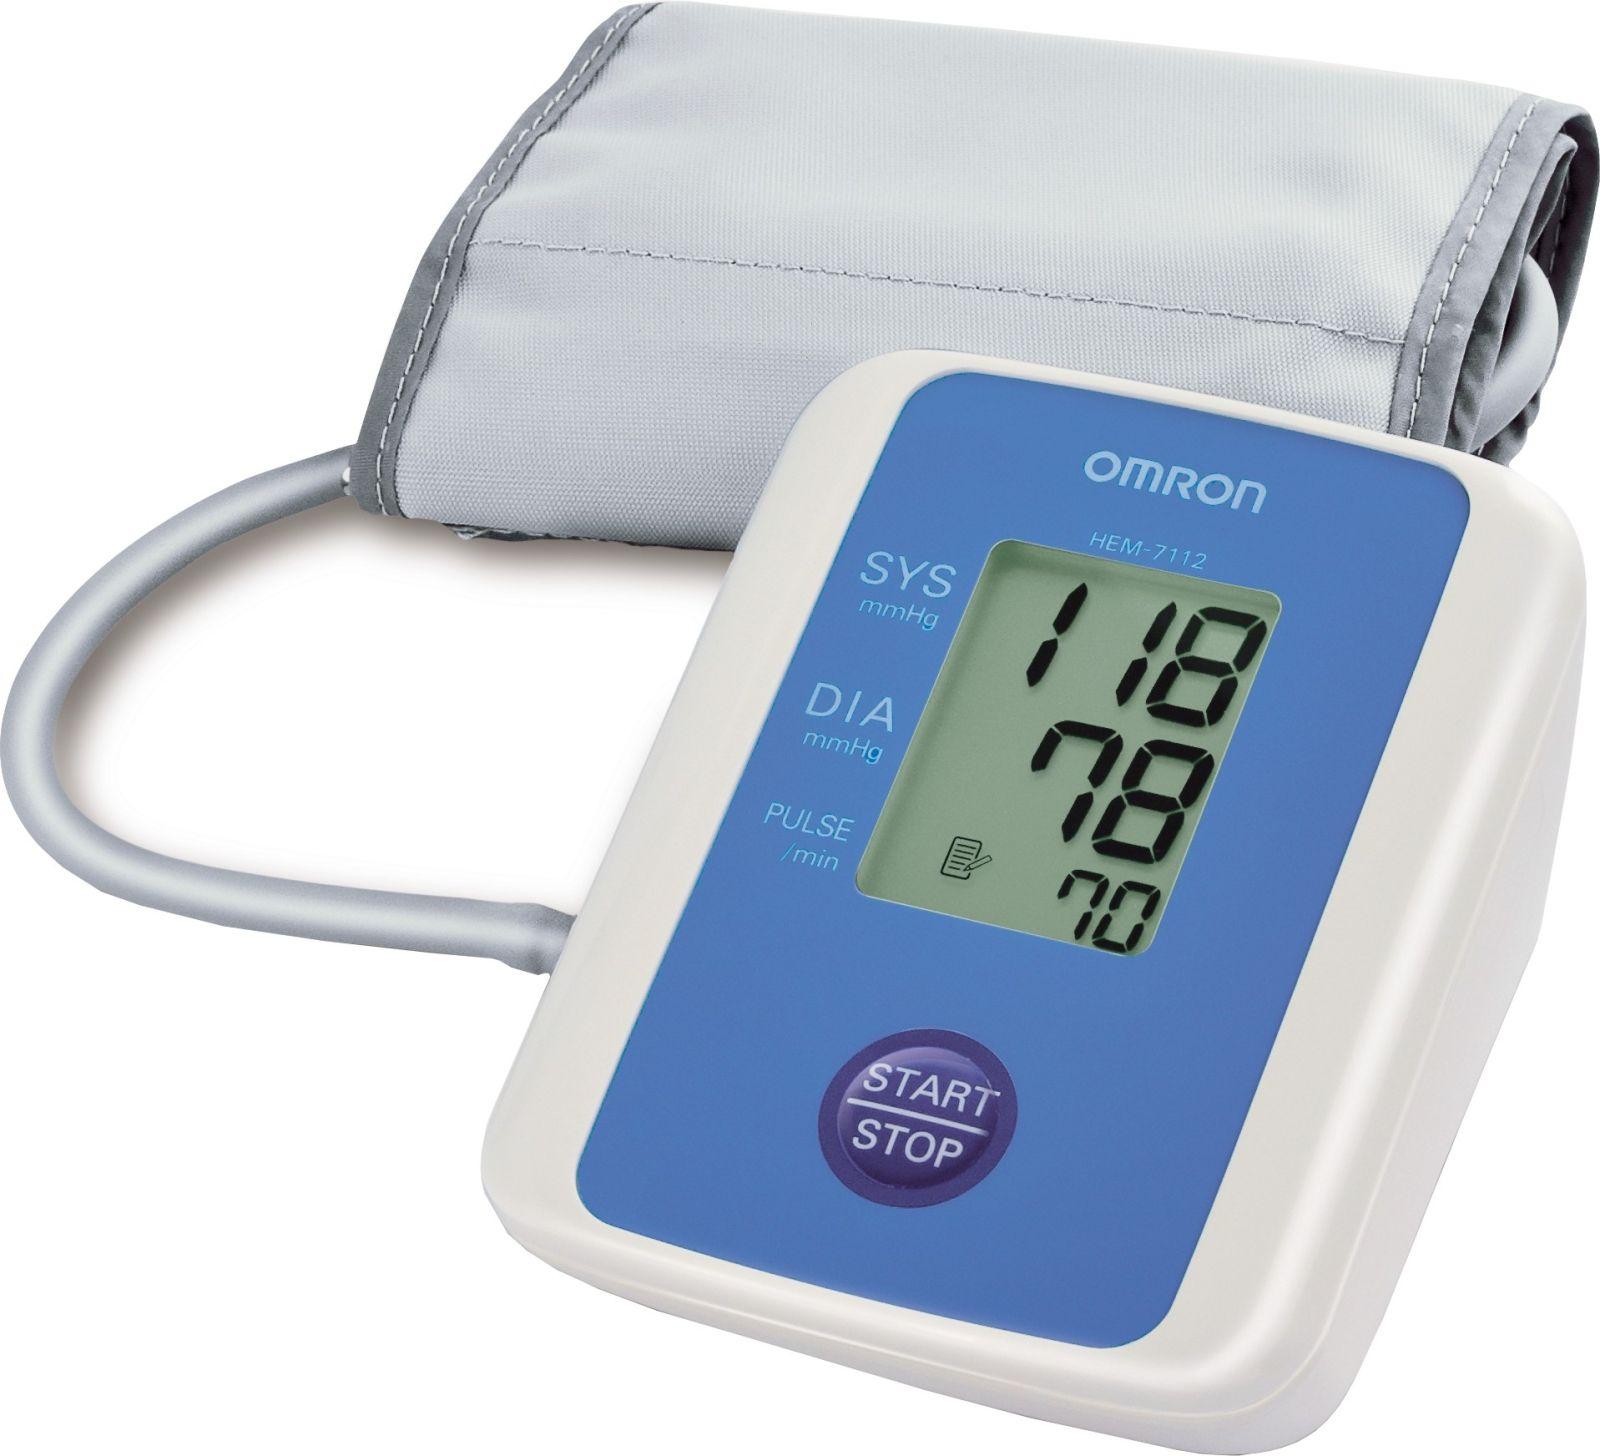 Omron HEM-7112 BP Monitor (White)